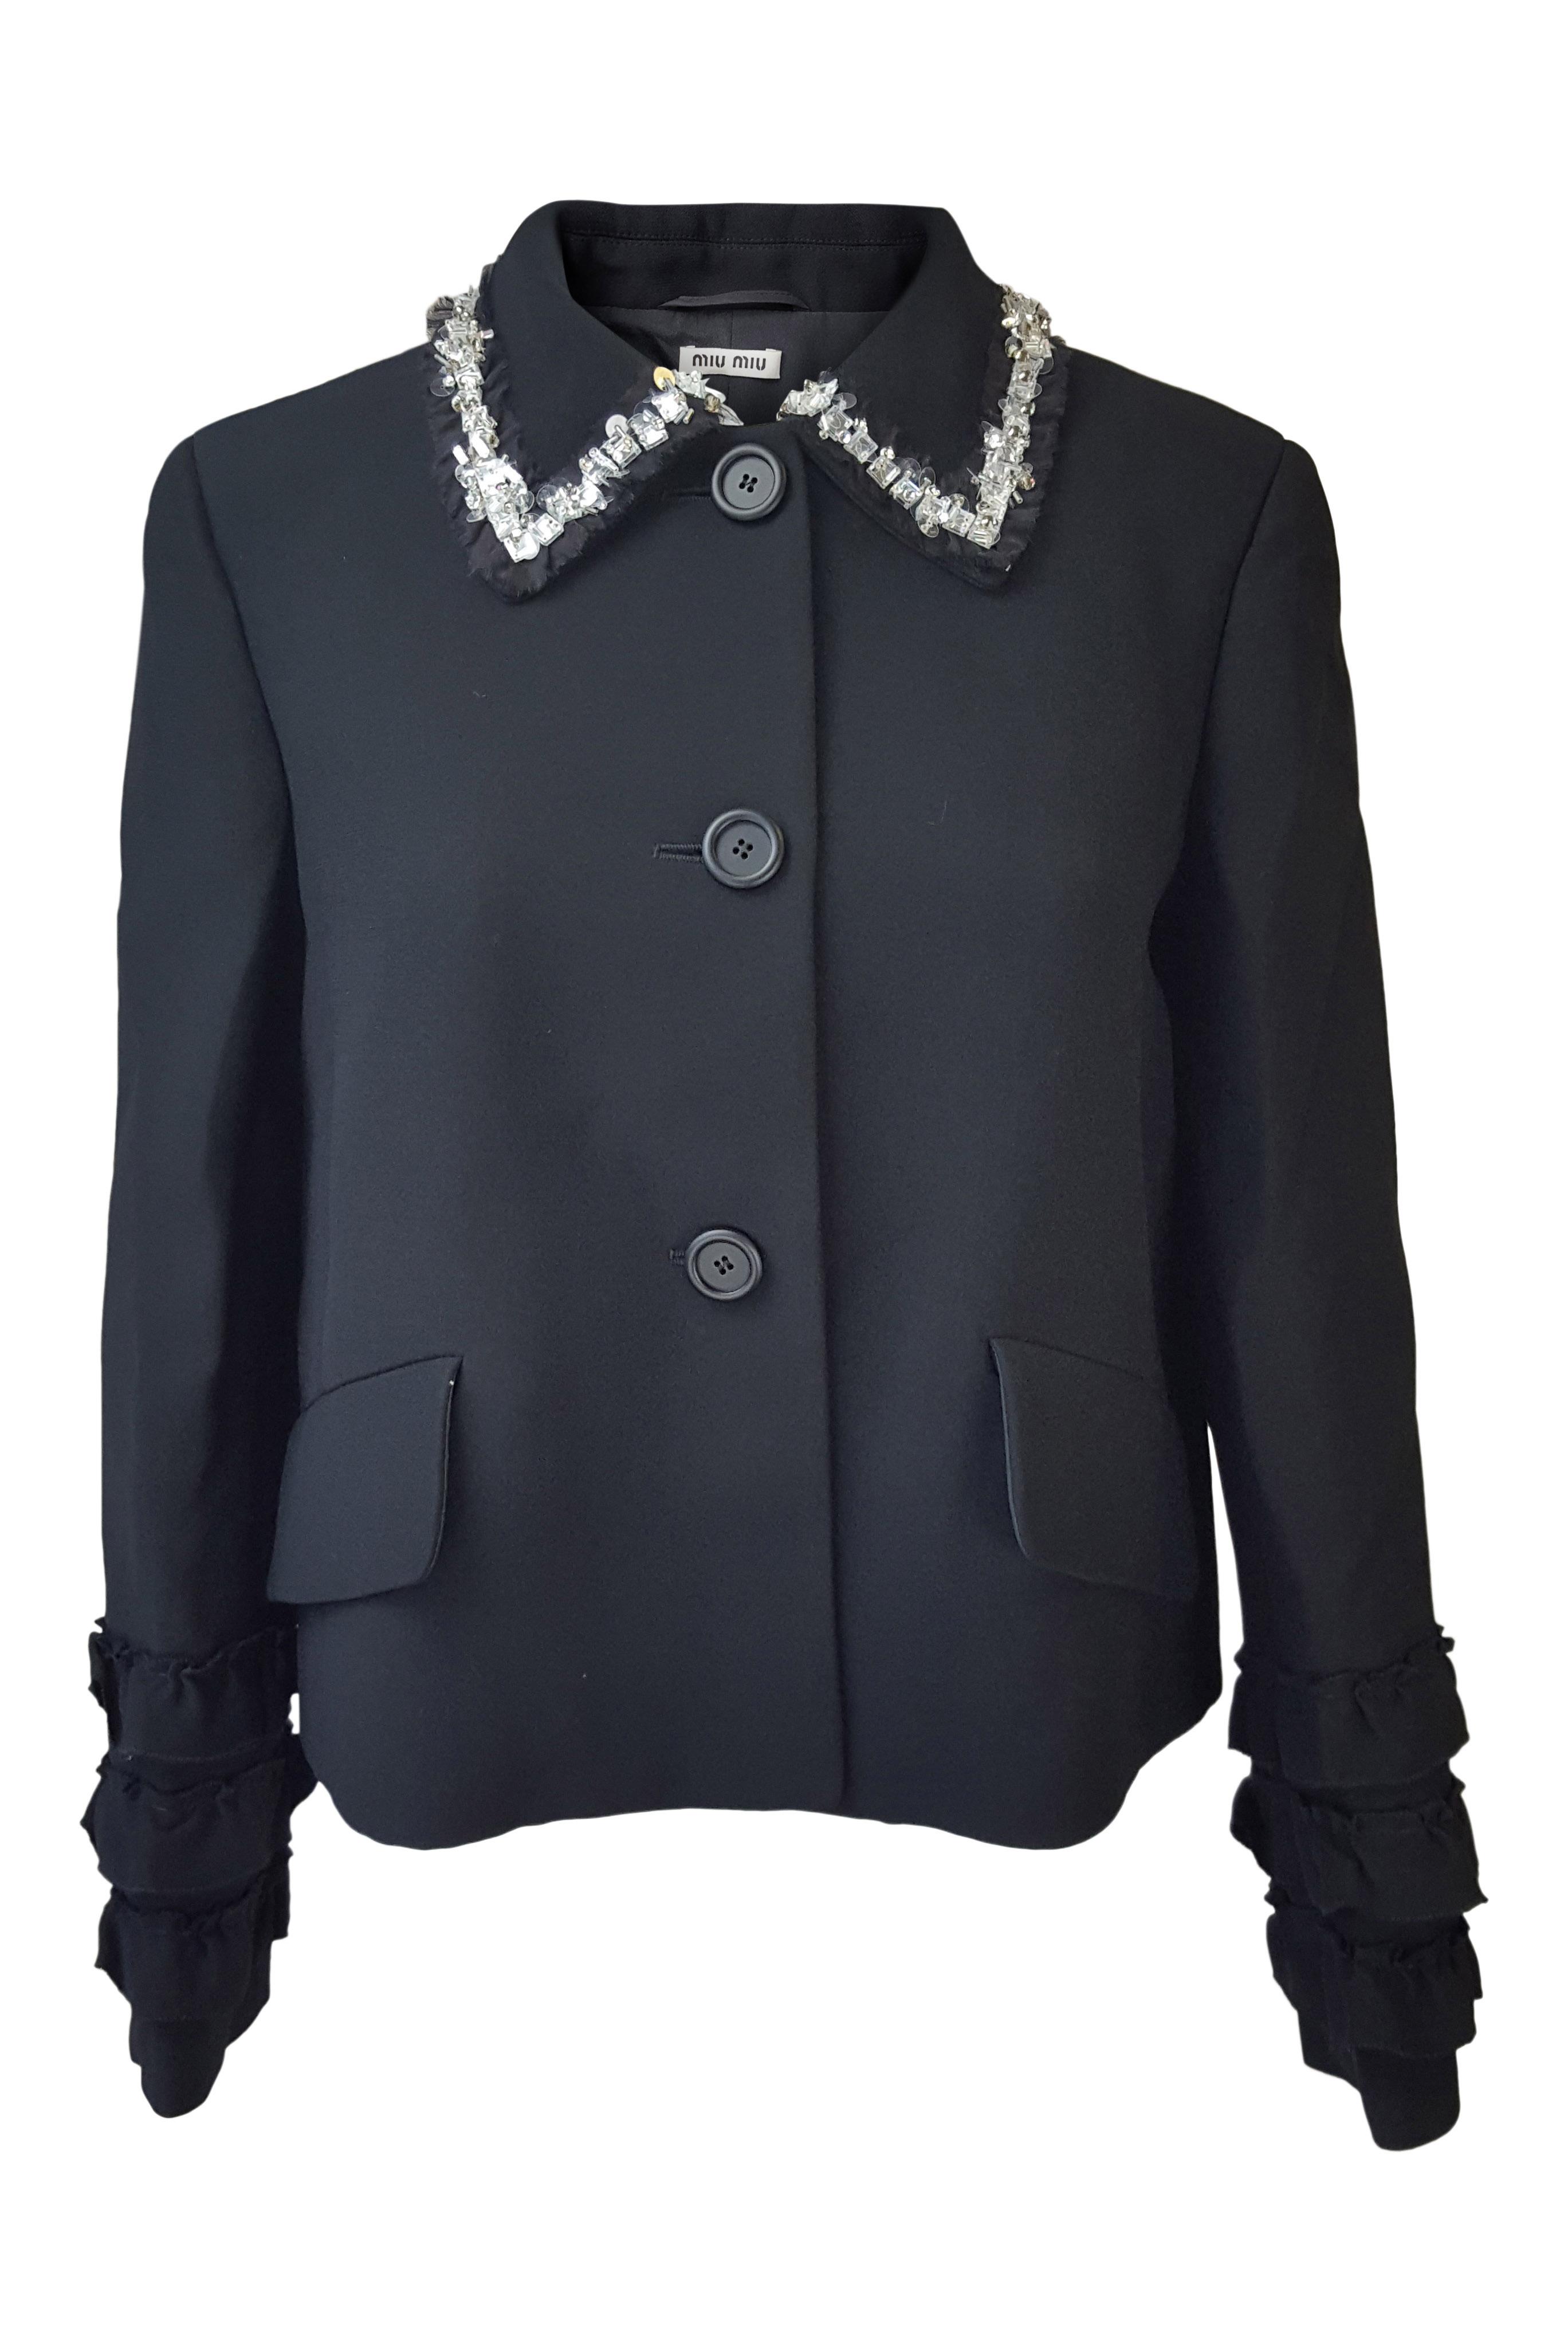 8671e37b37d12 Sentinel Thumbnail 1. Sentinel MIU MIU Black Wool Blend Embellished Collar  Ruffle Sleeved Jacket (IT 42)